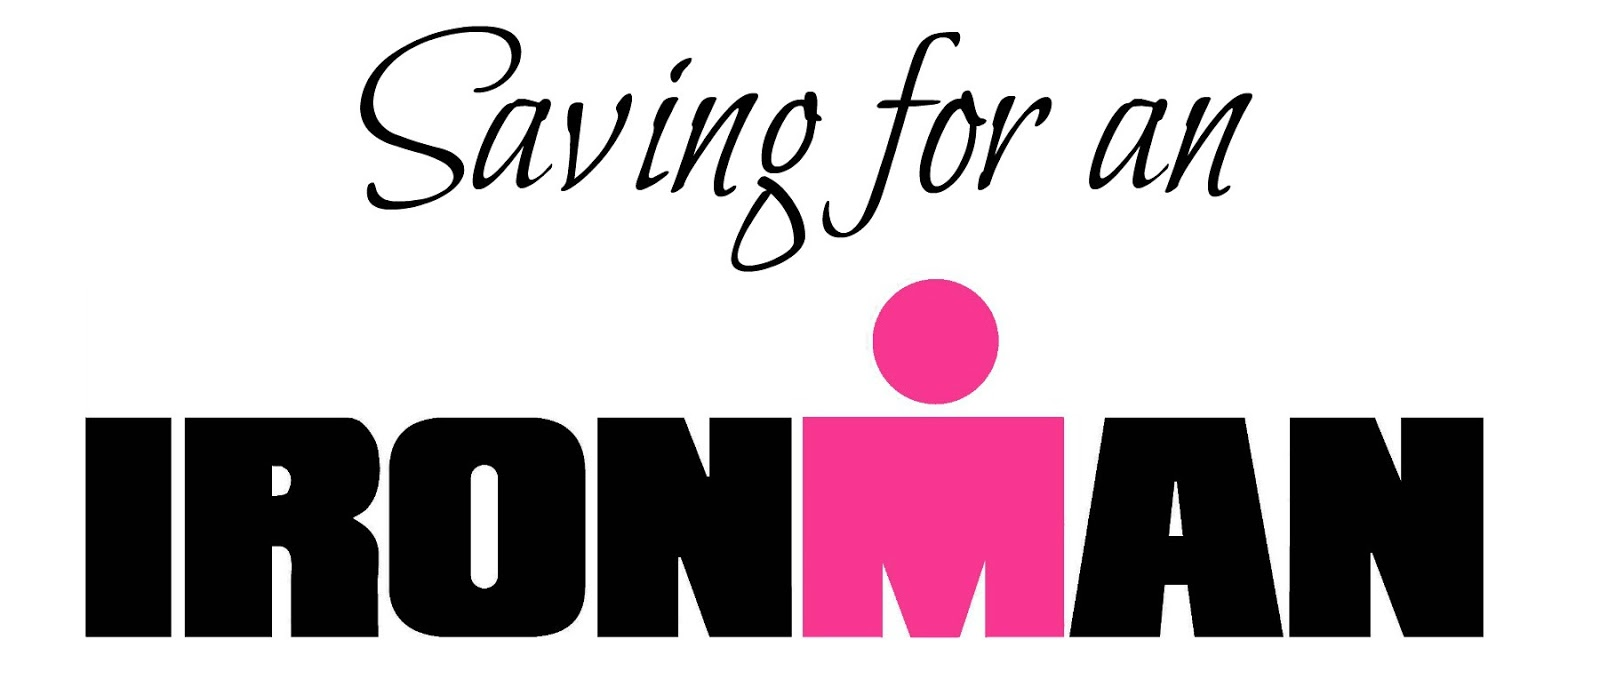 Saving for an Ironman